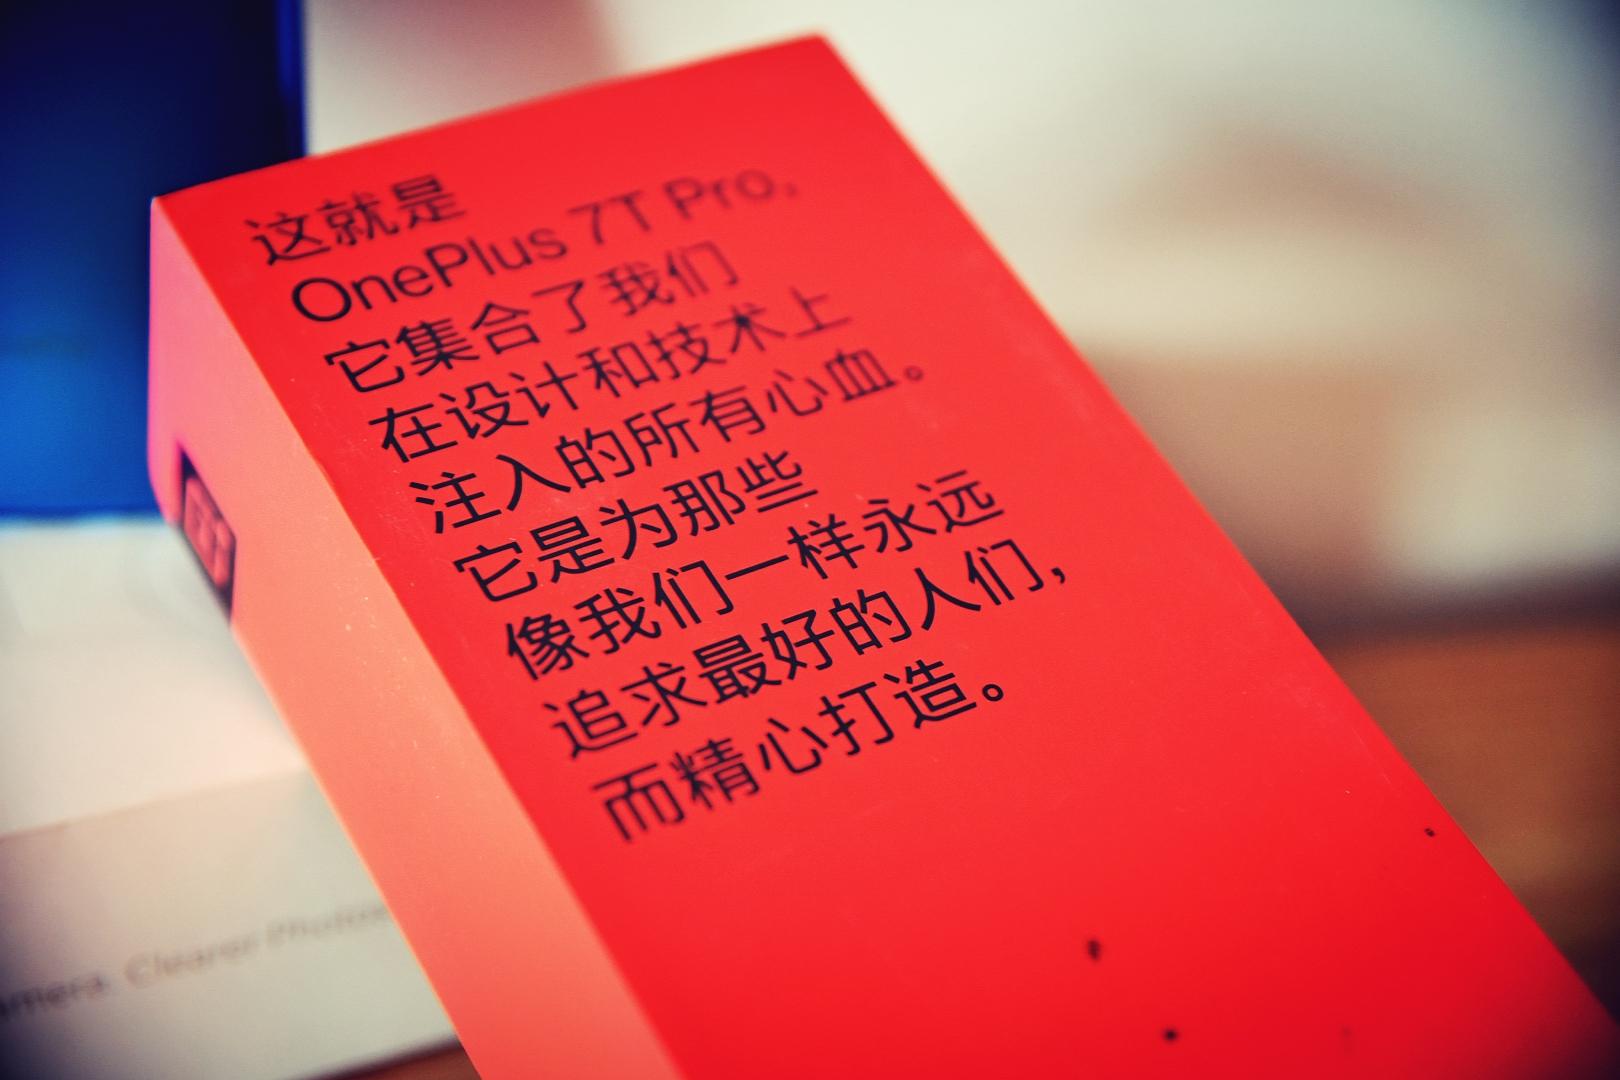 DSC_0883_mix01.jpg